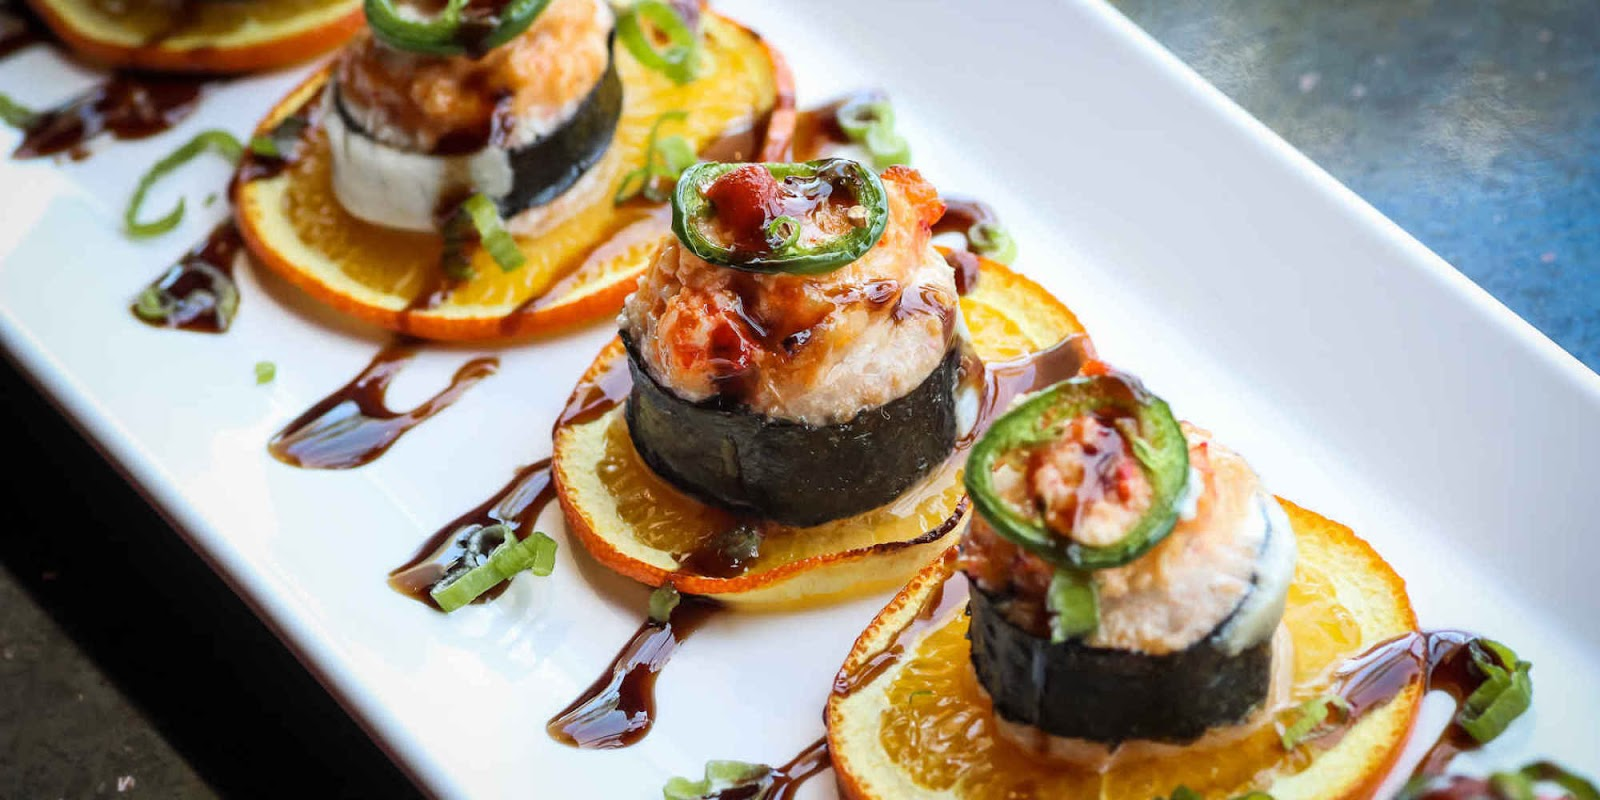 Best Online Food Gourmet Store